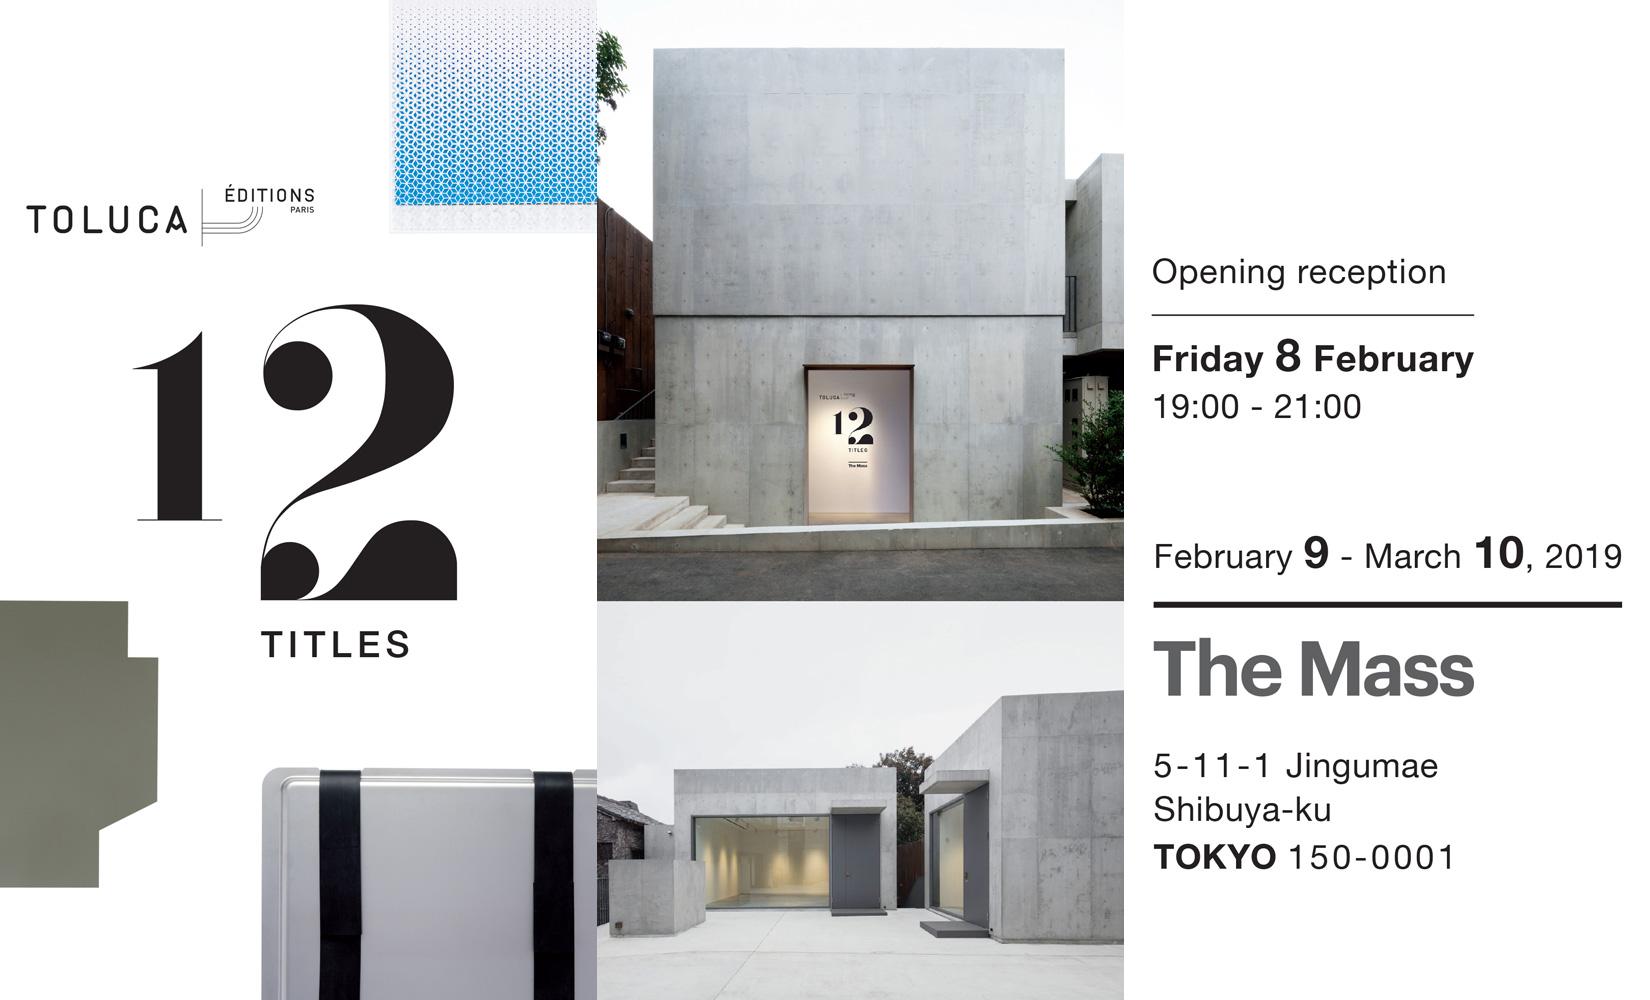 THE-MASS-TOKYO-TOLUCA-STUDIO-OLIVIER-ANDREOTTI.jpg